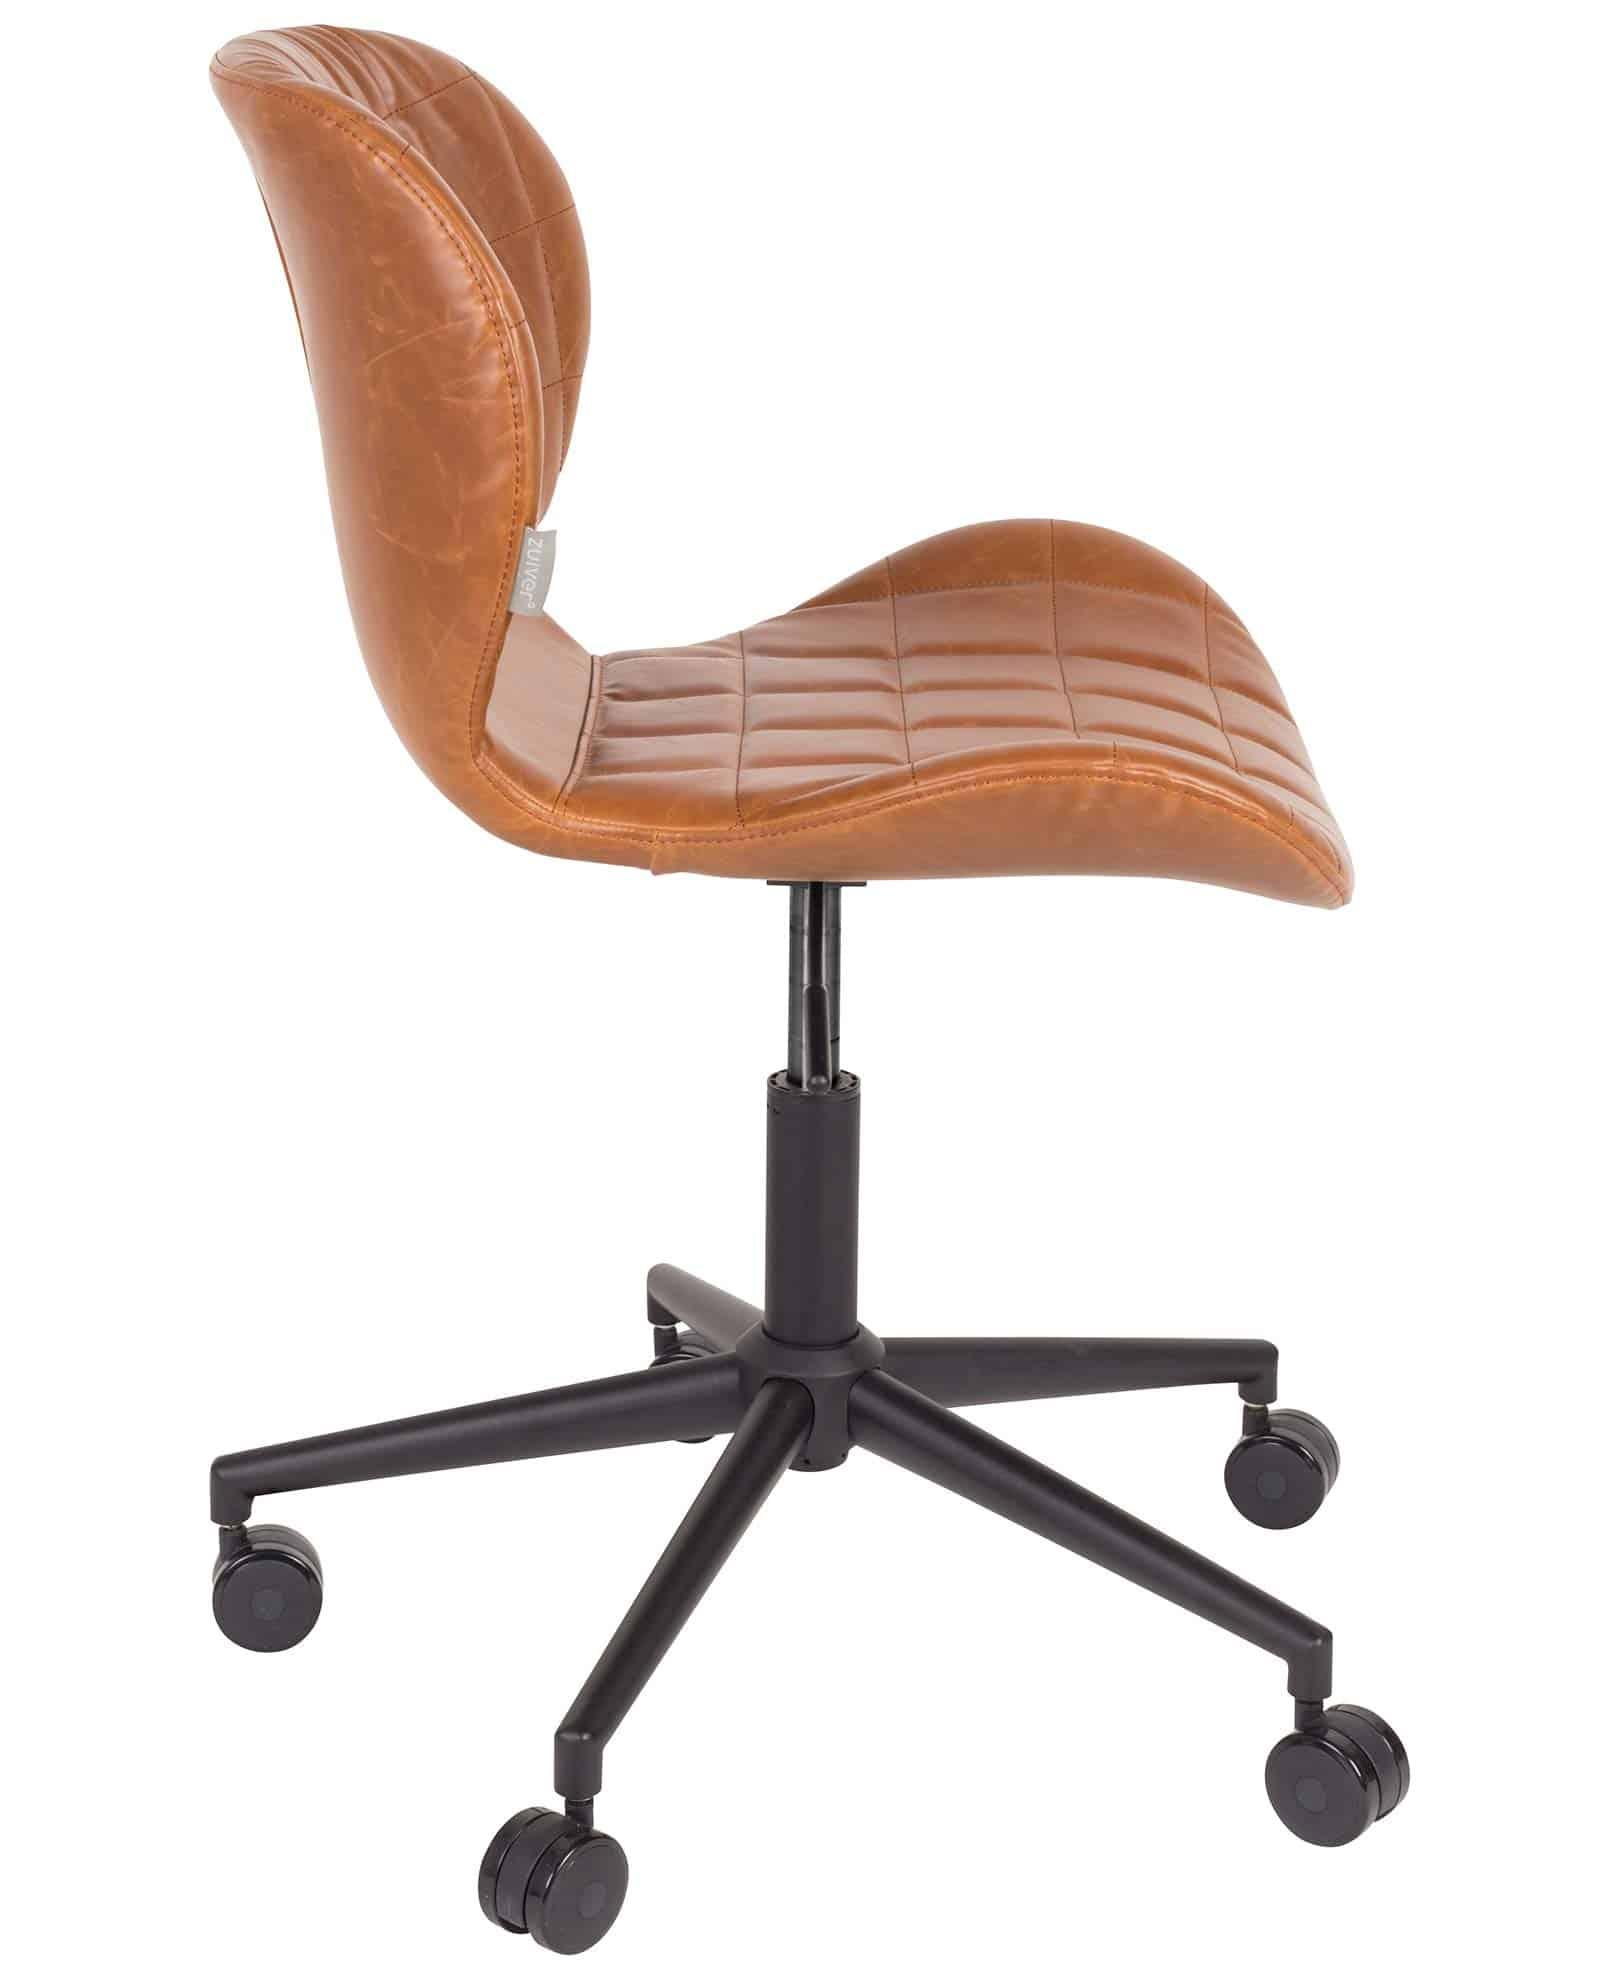 Zuiver Omg Bureaustoel.Omg Bureaustoel Ll By Zuiver Designshopp